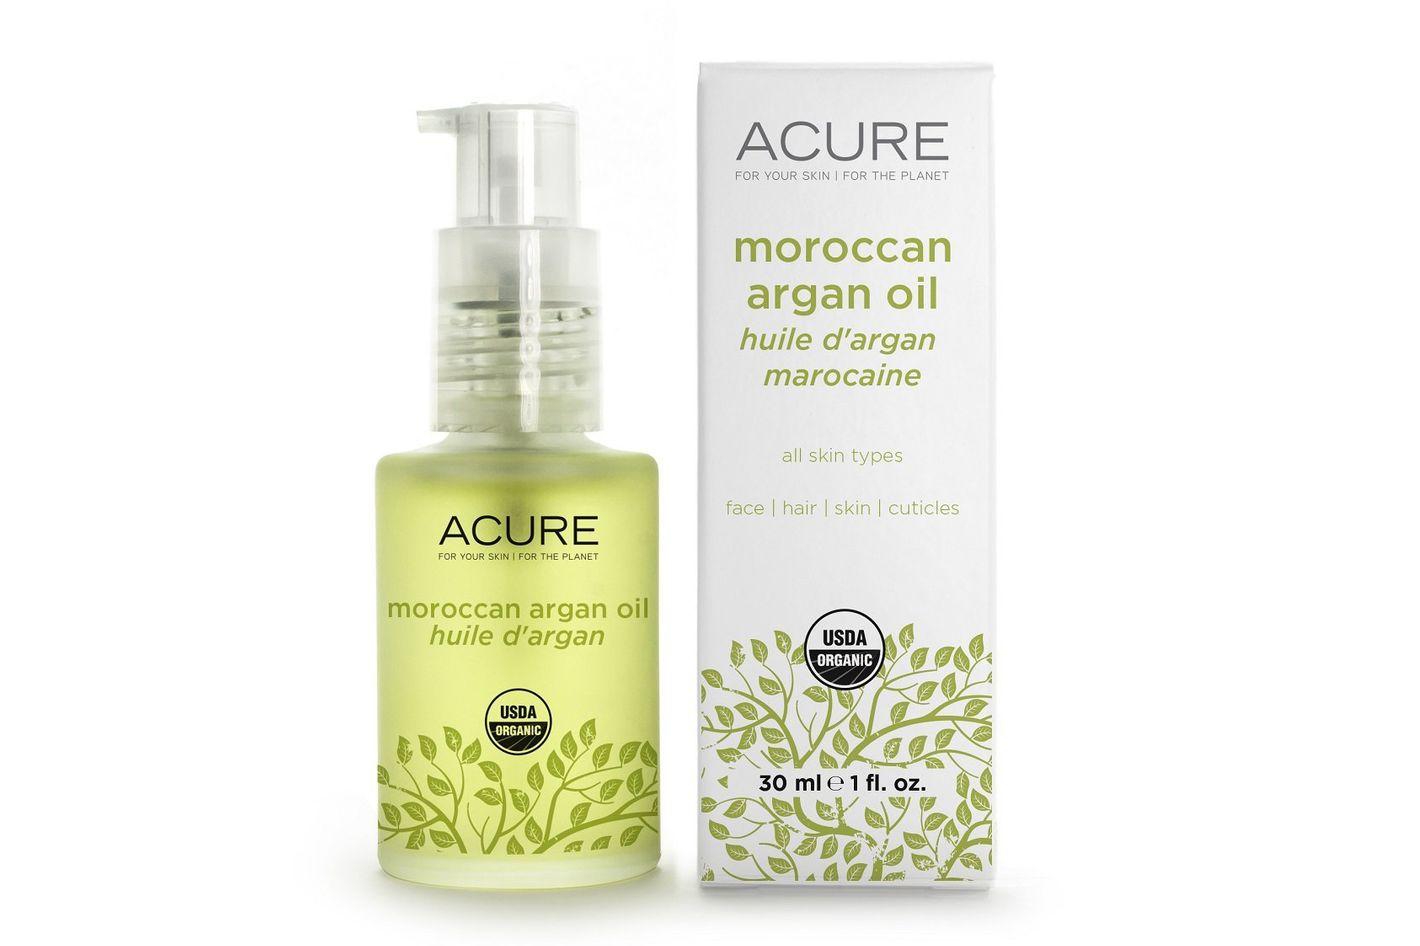 Acure Argan Oil